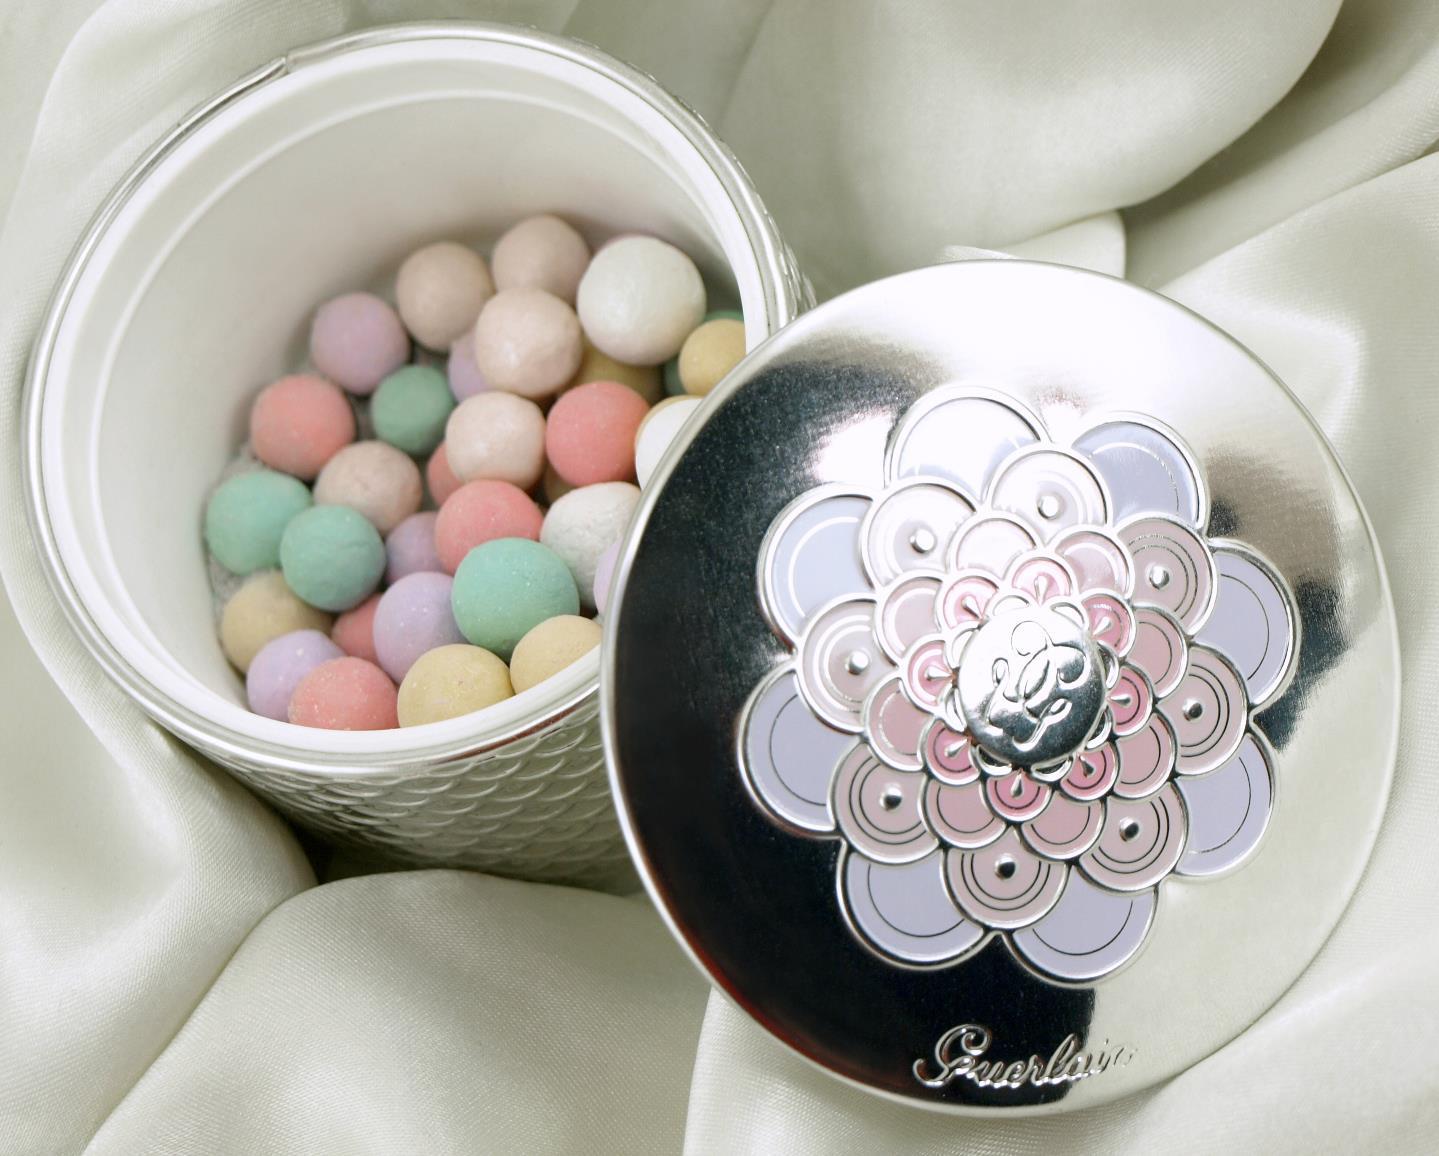 be butterfly guerlain meteorites perles de poudre. Black Bedroom Furniture Sets. Home Design Ideas